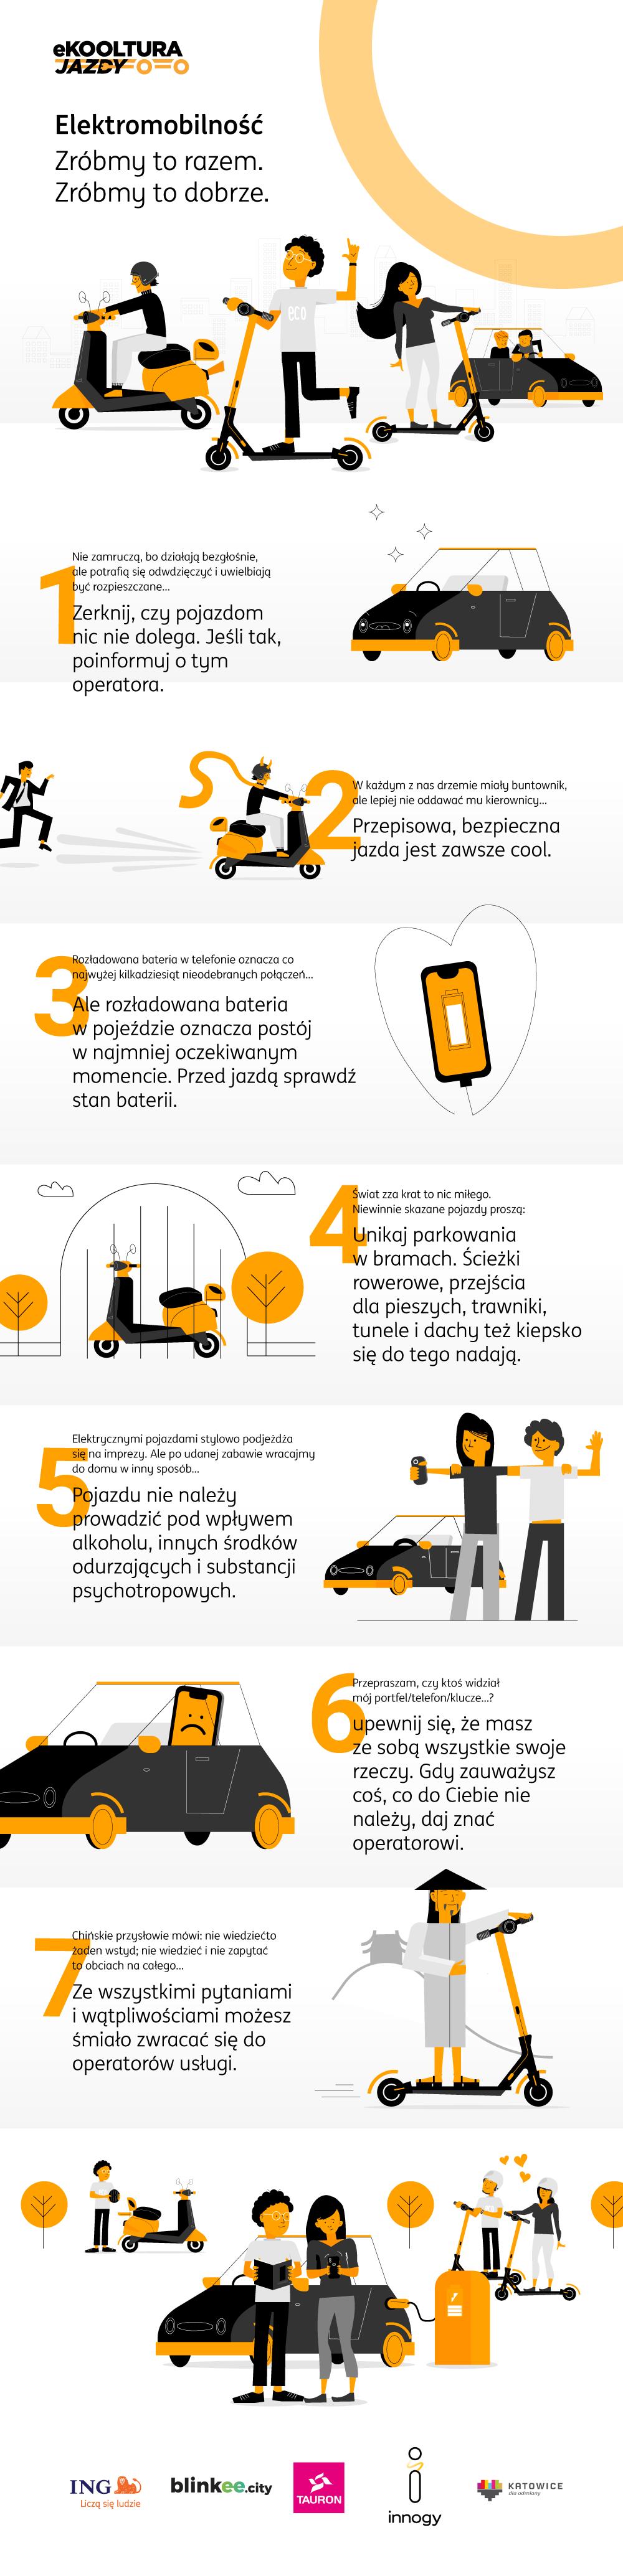 eKOOLTURA-JAZDY-infografika